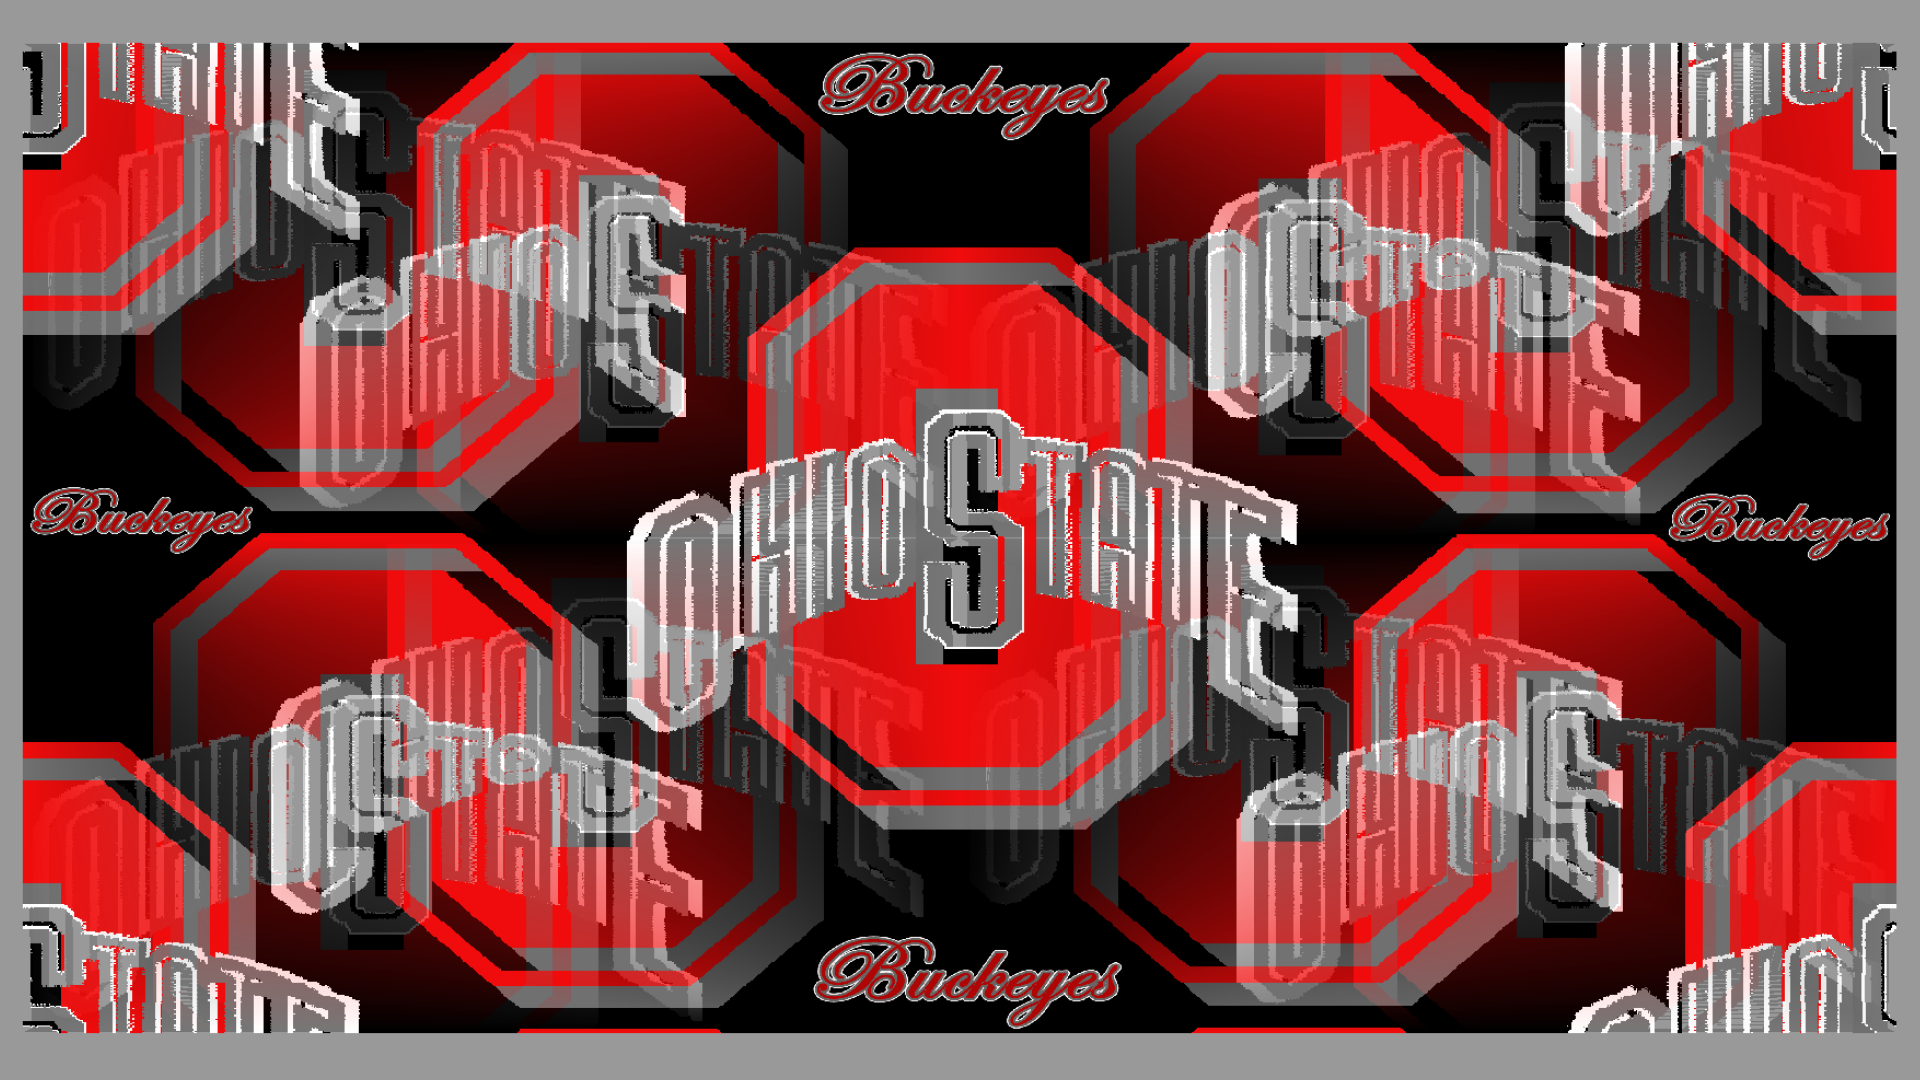 OHIO STATE BUCKEYES RED & GRAY BLOCK O - Ohio State Buckeyes Wallpaper ...